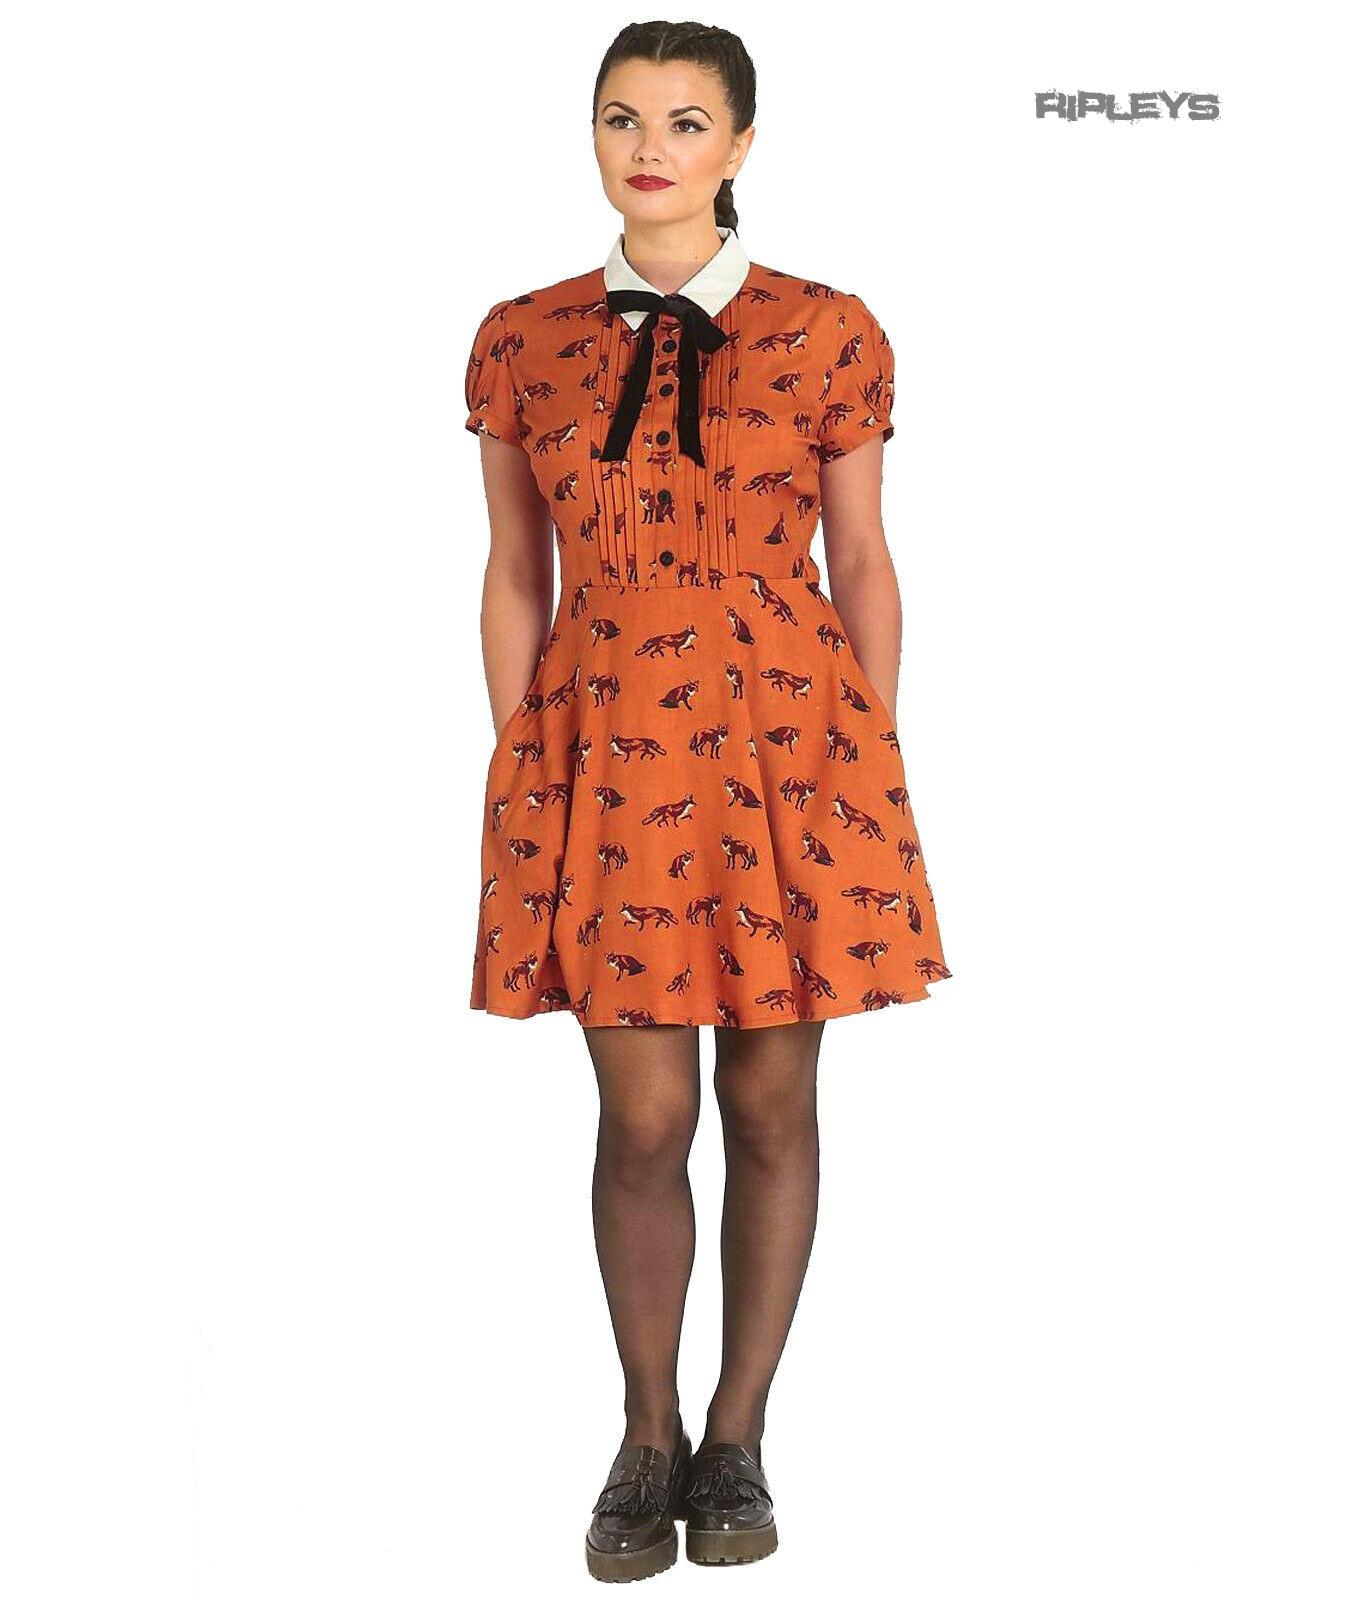 Hell-Bunny-40s-50s-Brown-Mini-Dress-Pin-Up-VIXEY-Vixen-Fox-Print-All-Sizes thumbnail 10